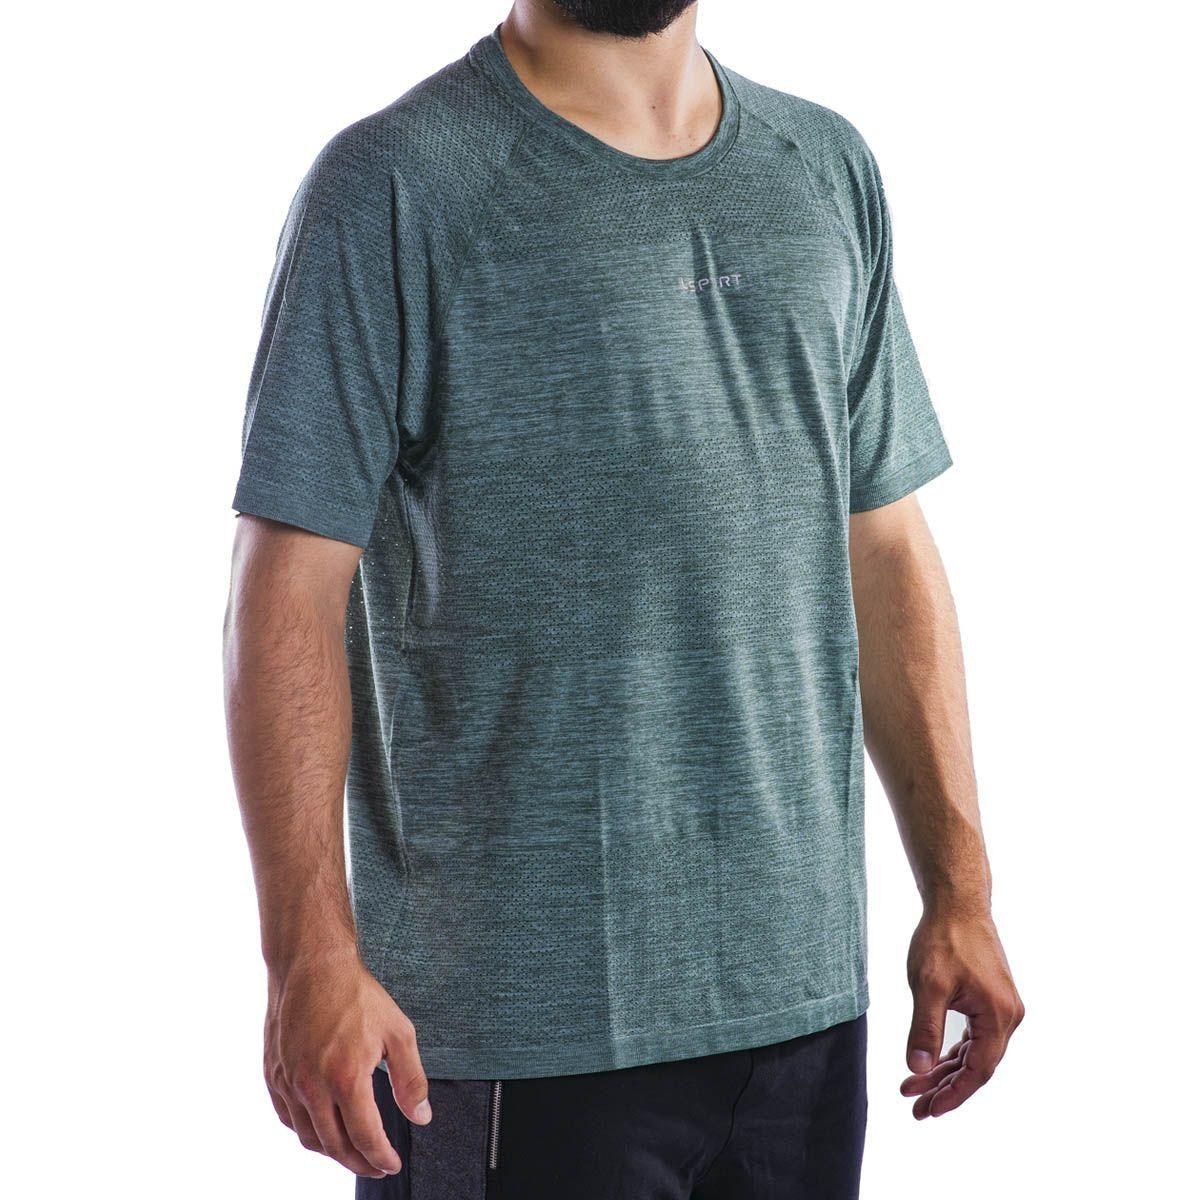 Camiseta Masculina Lupo Comfort Fit - T-Shirt Run Free Sport .